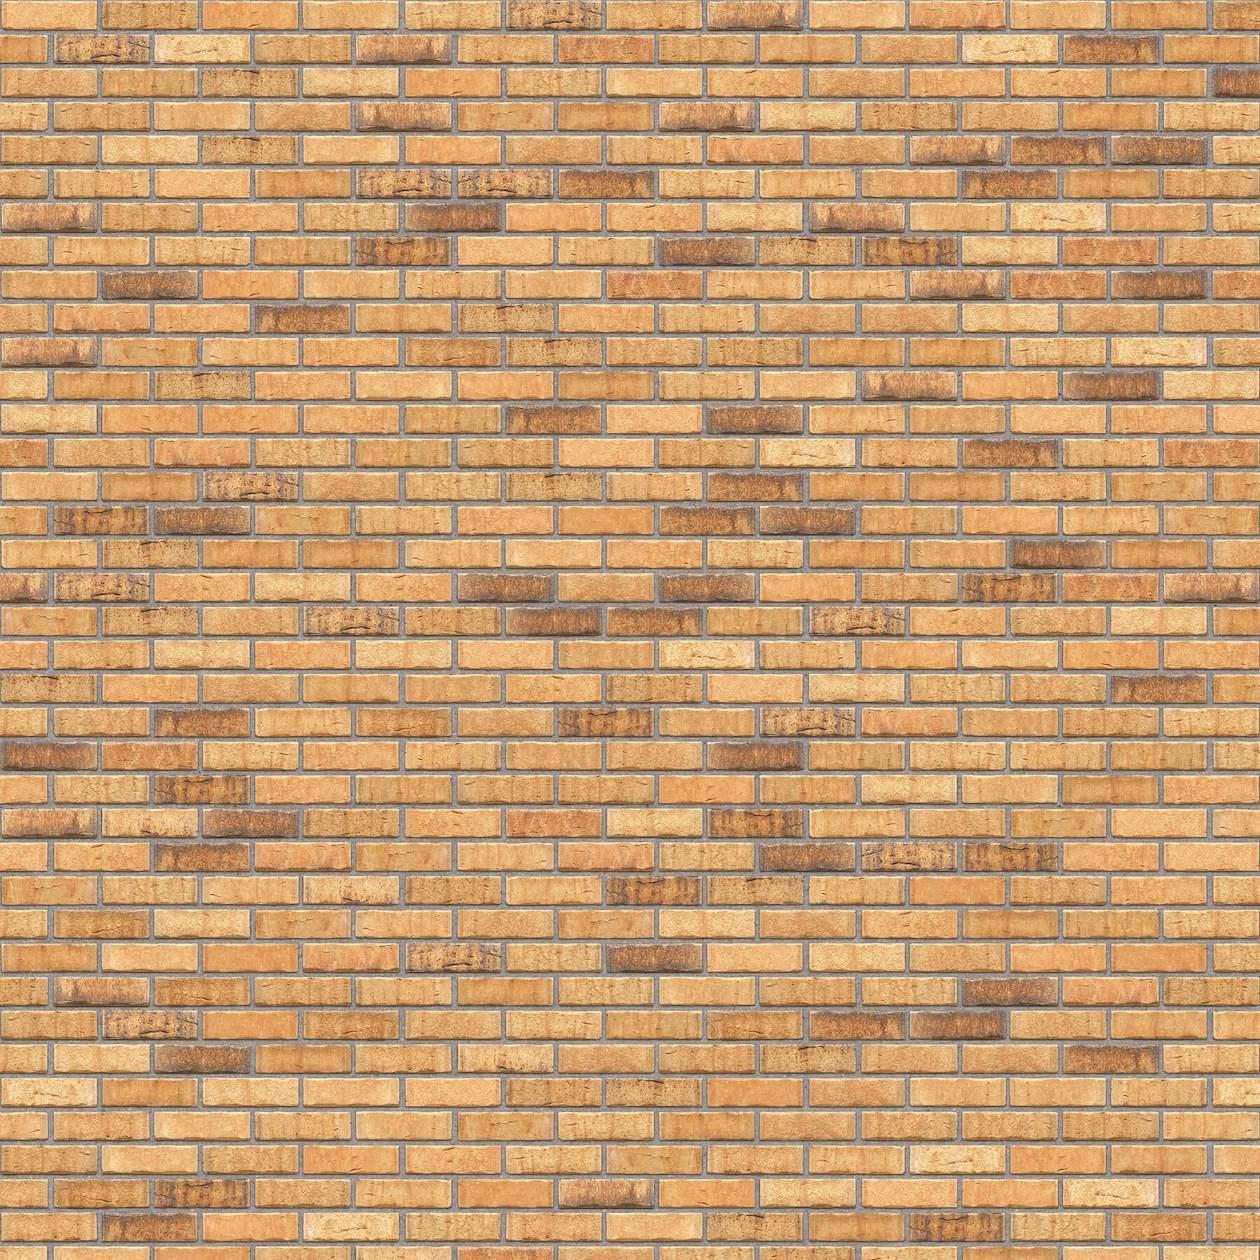 Puna-cigla-FeldHaus-Klinker-brick-house-nf-k-665-Siva Fuga